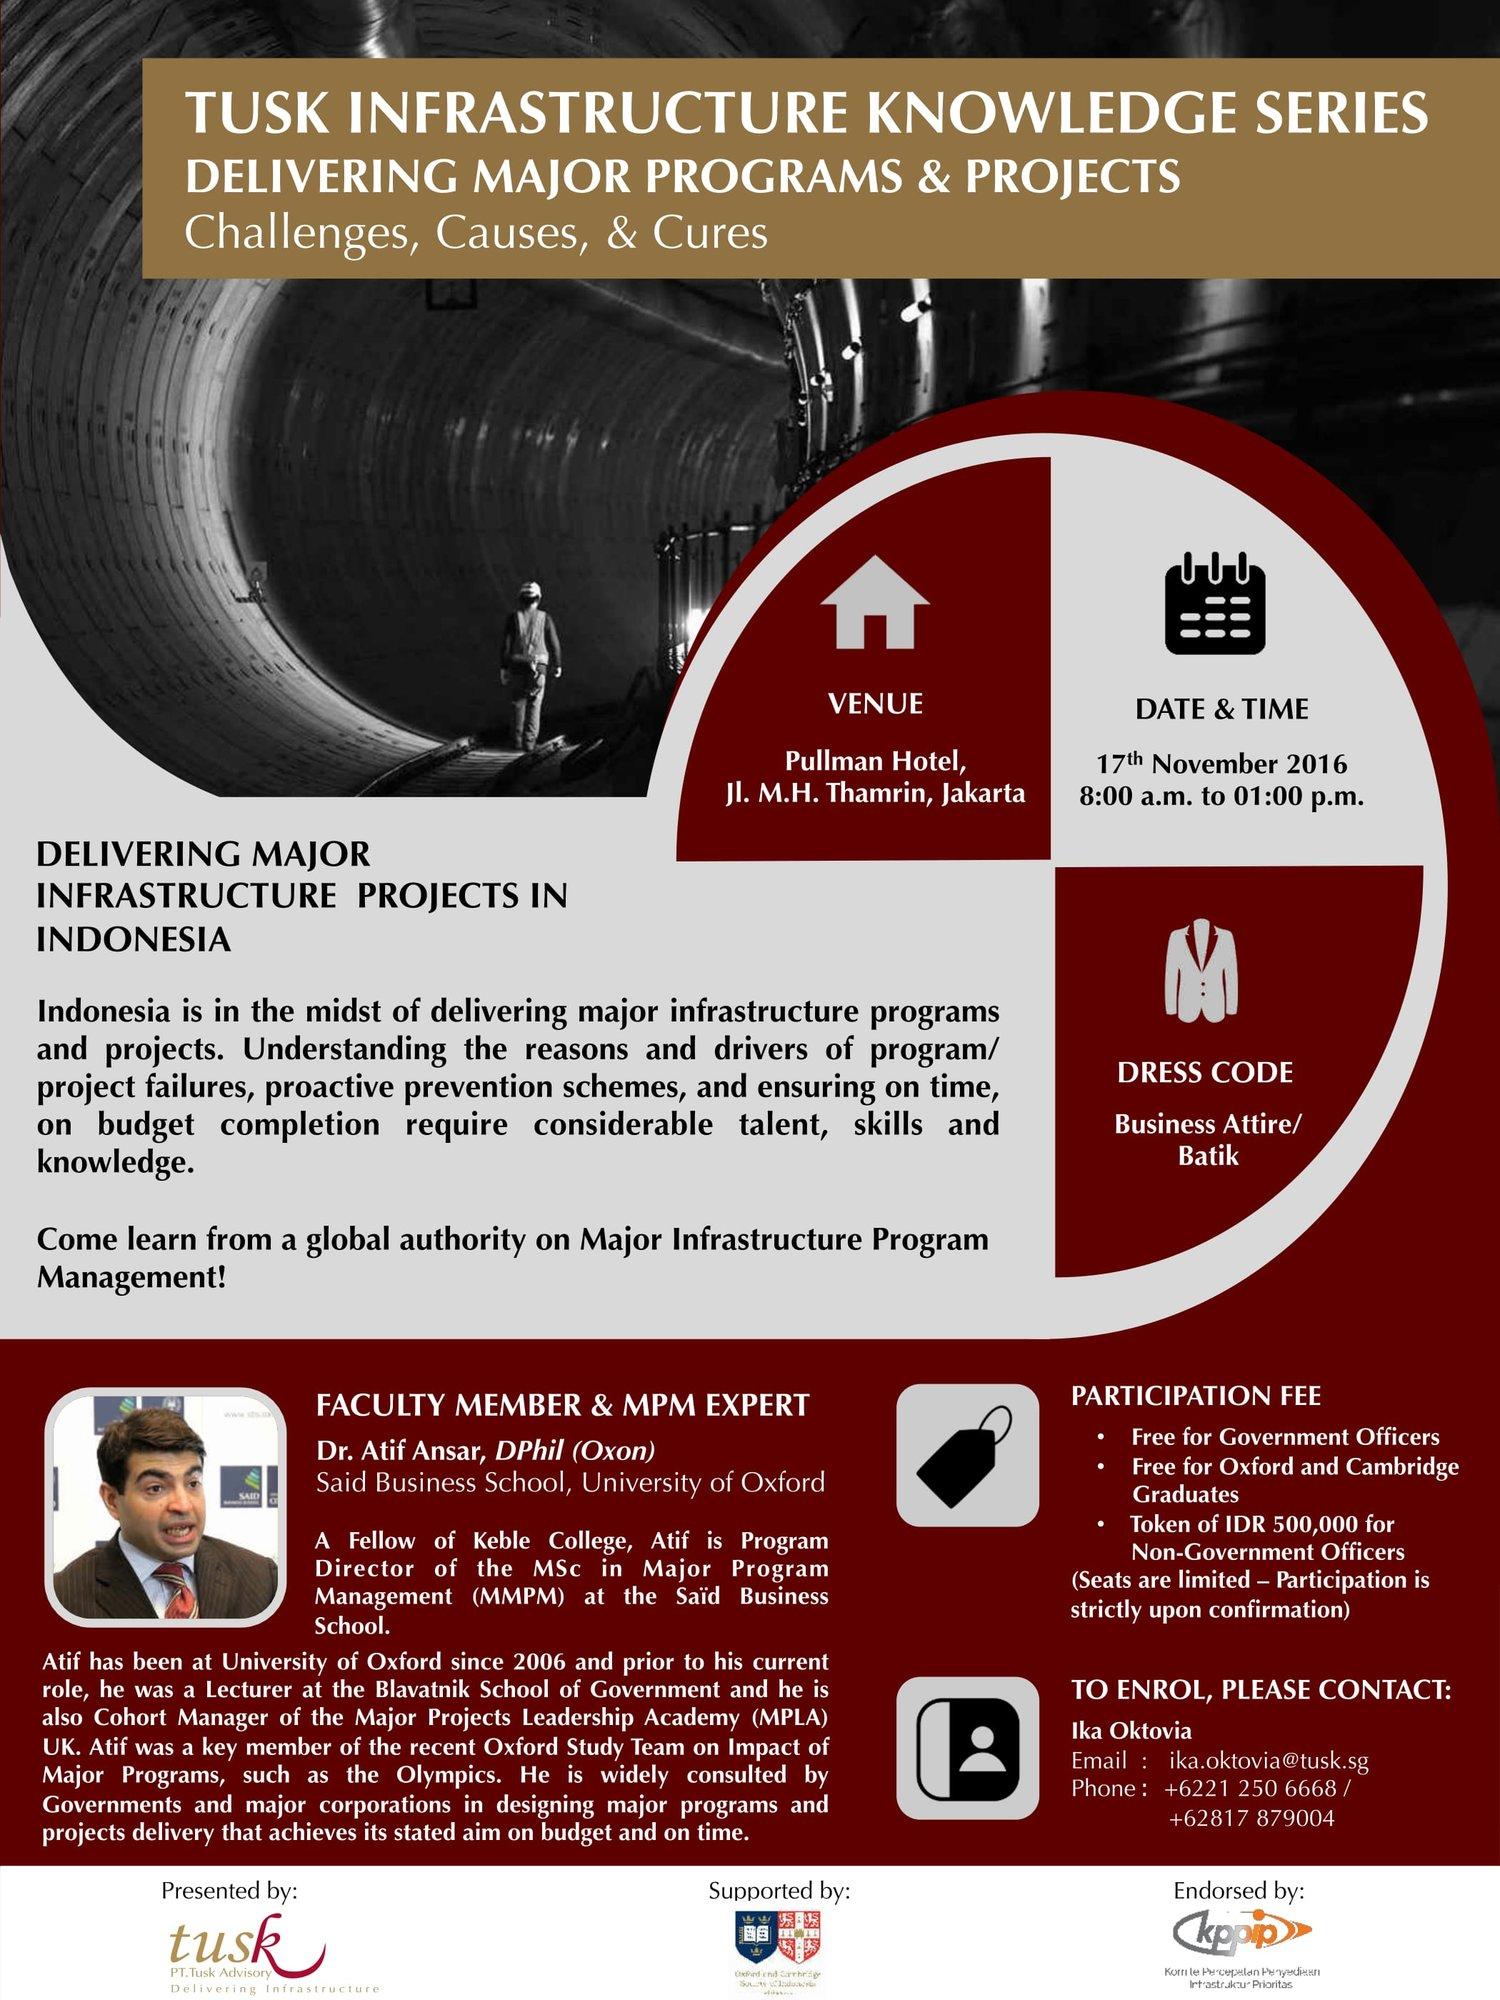 Event Tusk Infrastructure Knowledge Series Delivering Major